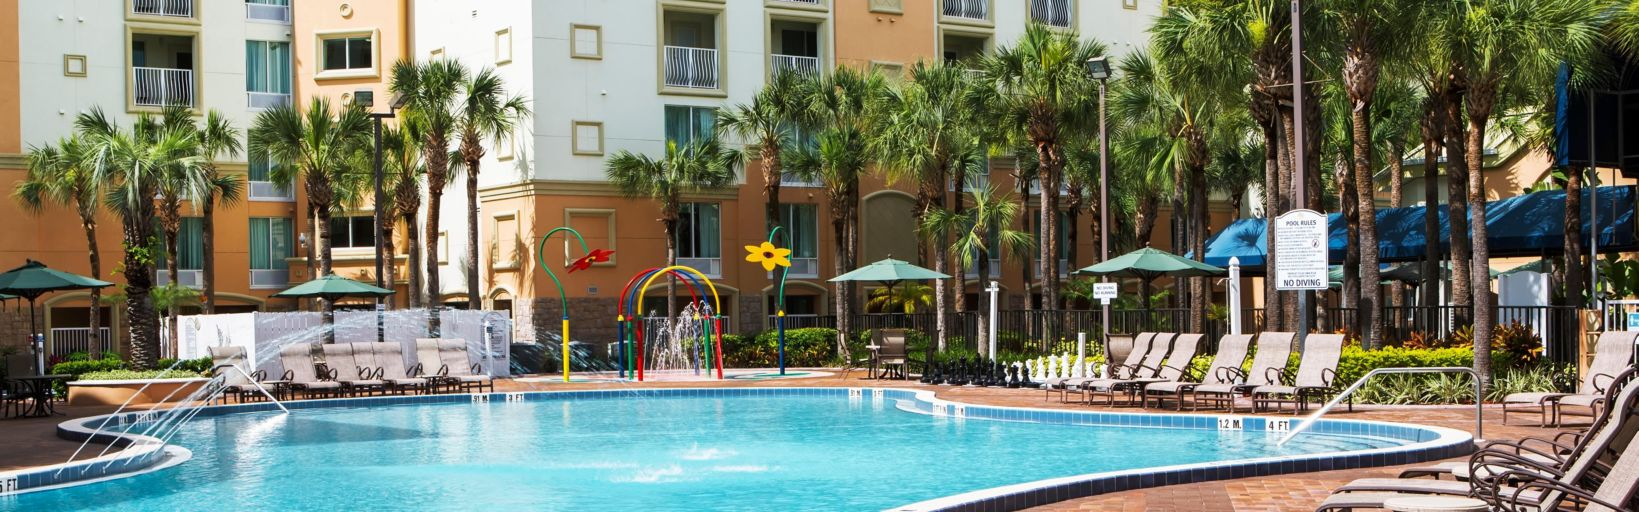 Hotels near Downtown Disney | Holiday Inn Resort Orlando Lake Buena ...